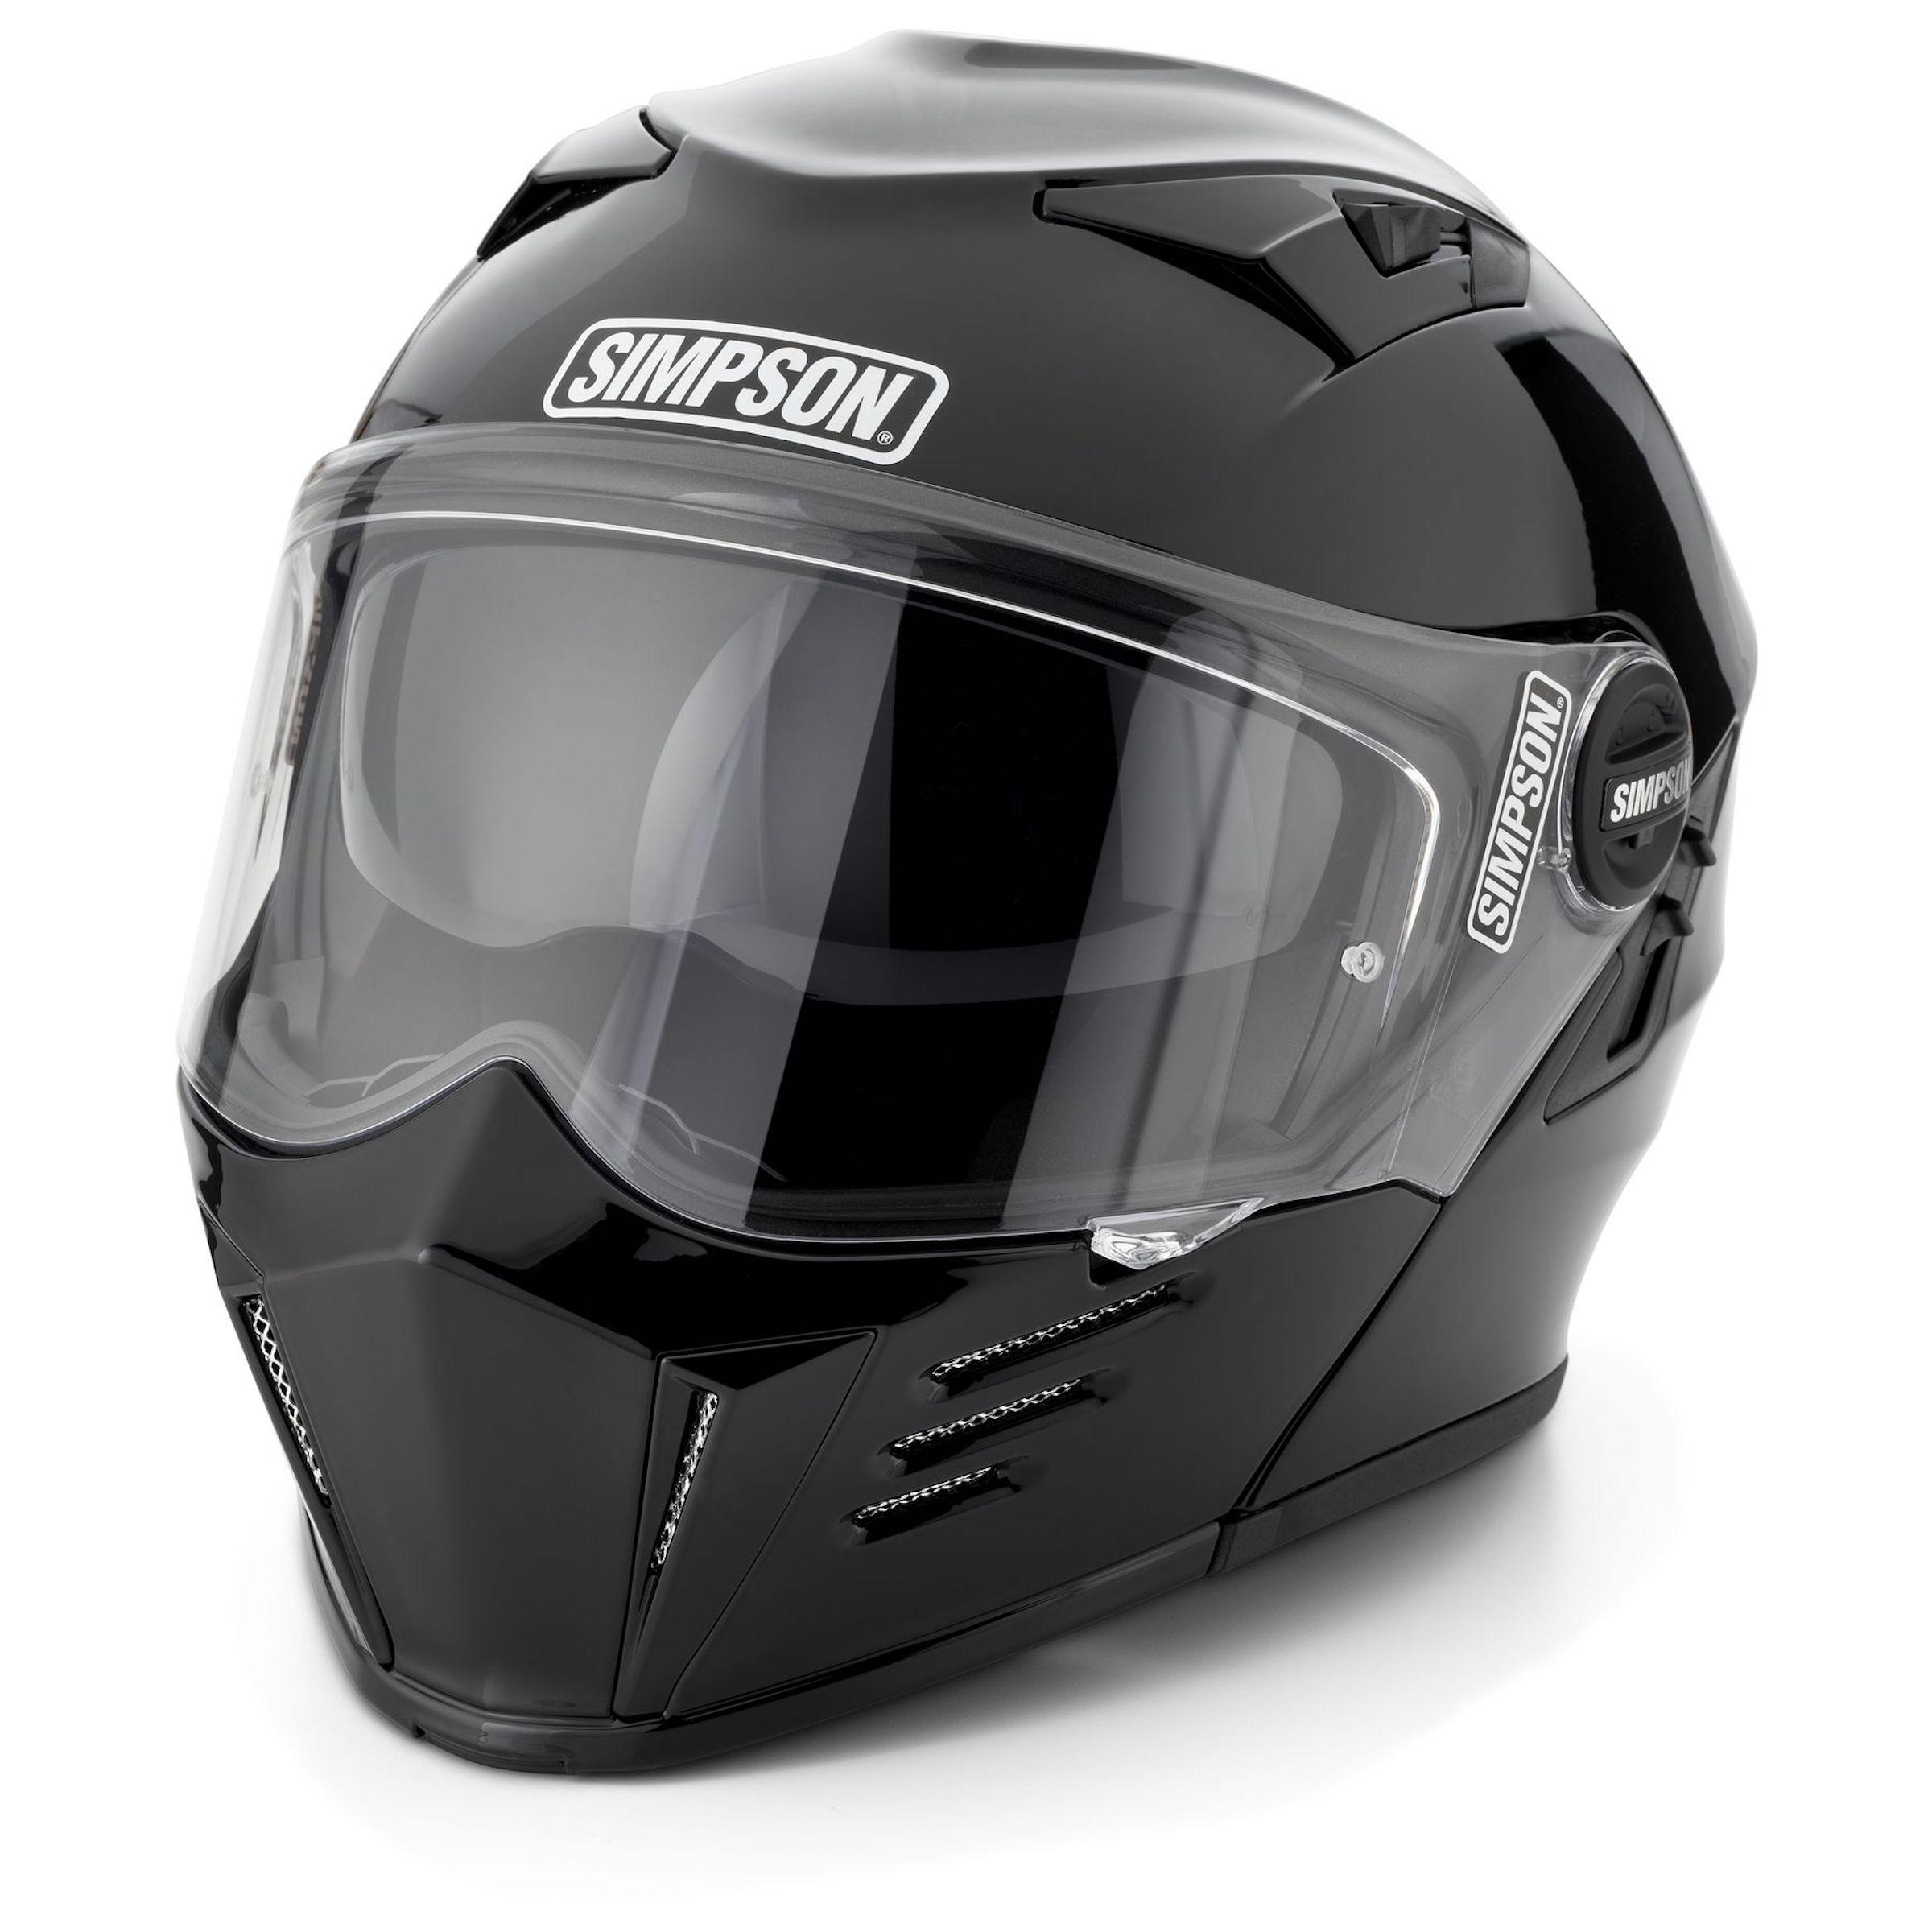 Lightweight Motorcycle Helmet >> Simpson Mod Bandit Helmet - A Retro Modular Helmet